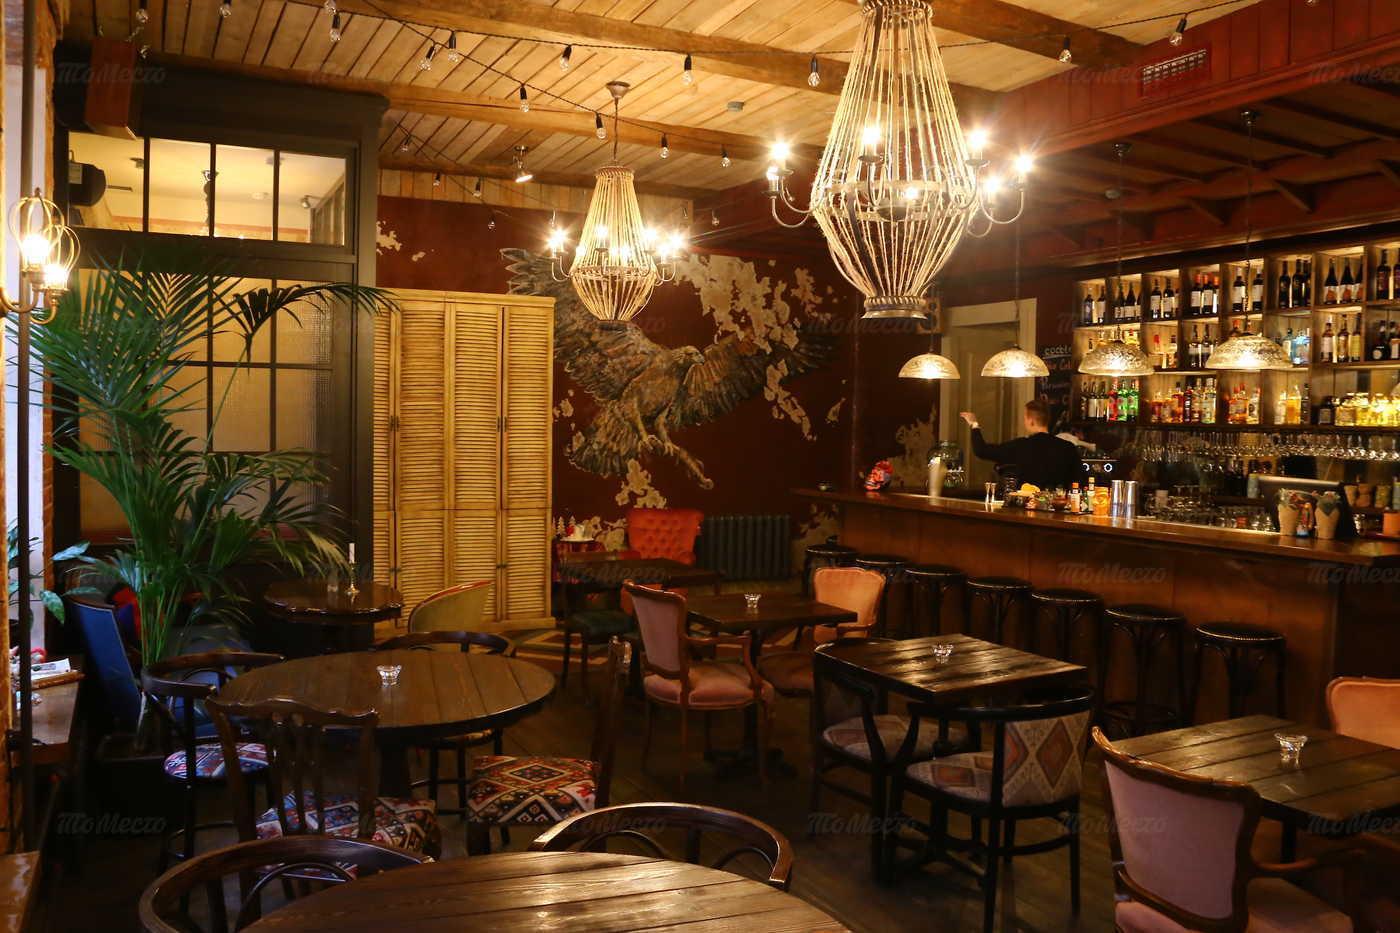 Ресторан Мапуче (Mapuche) на улице Некрасова фото 4